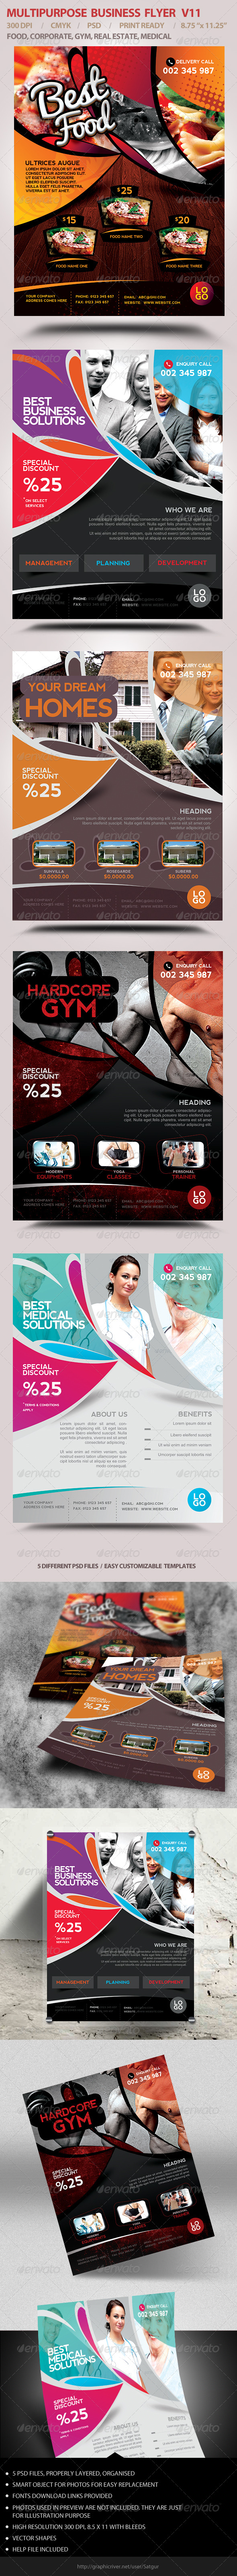 GraphicRiver Multipurpose Business Flyer V11 6944965